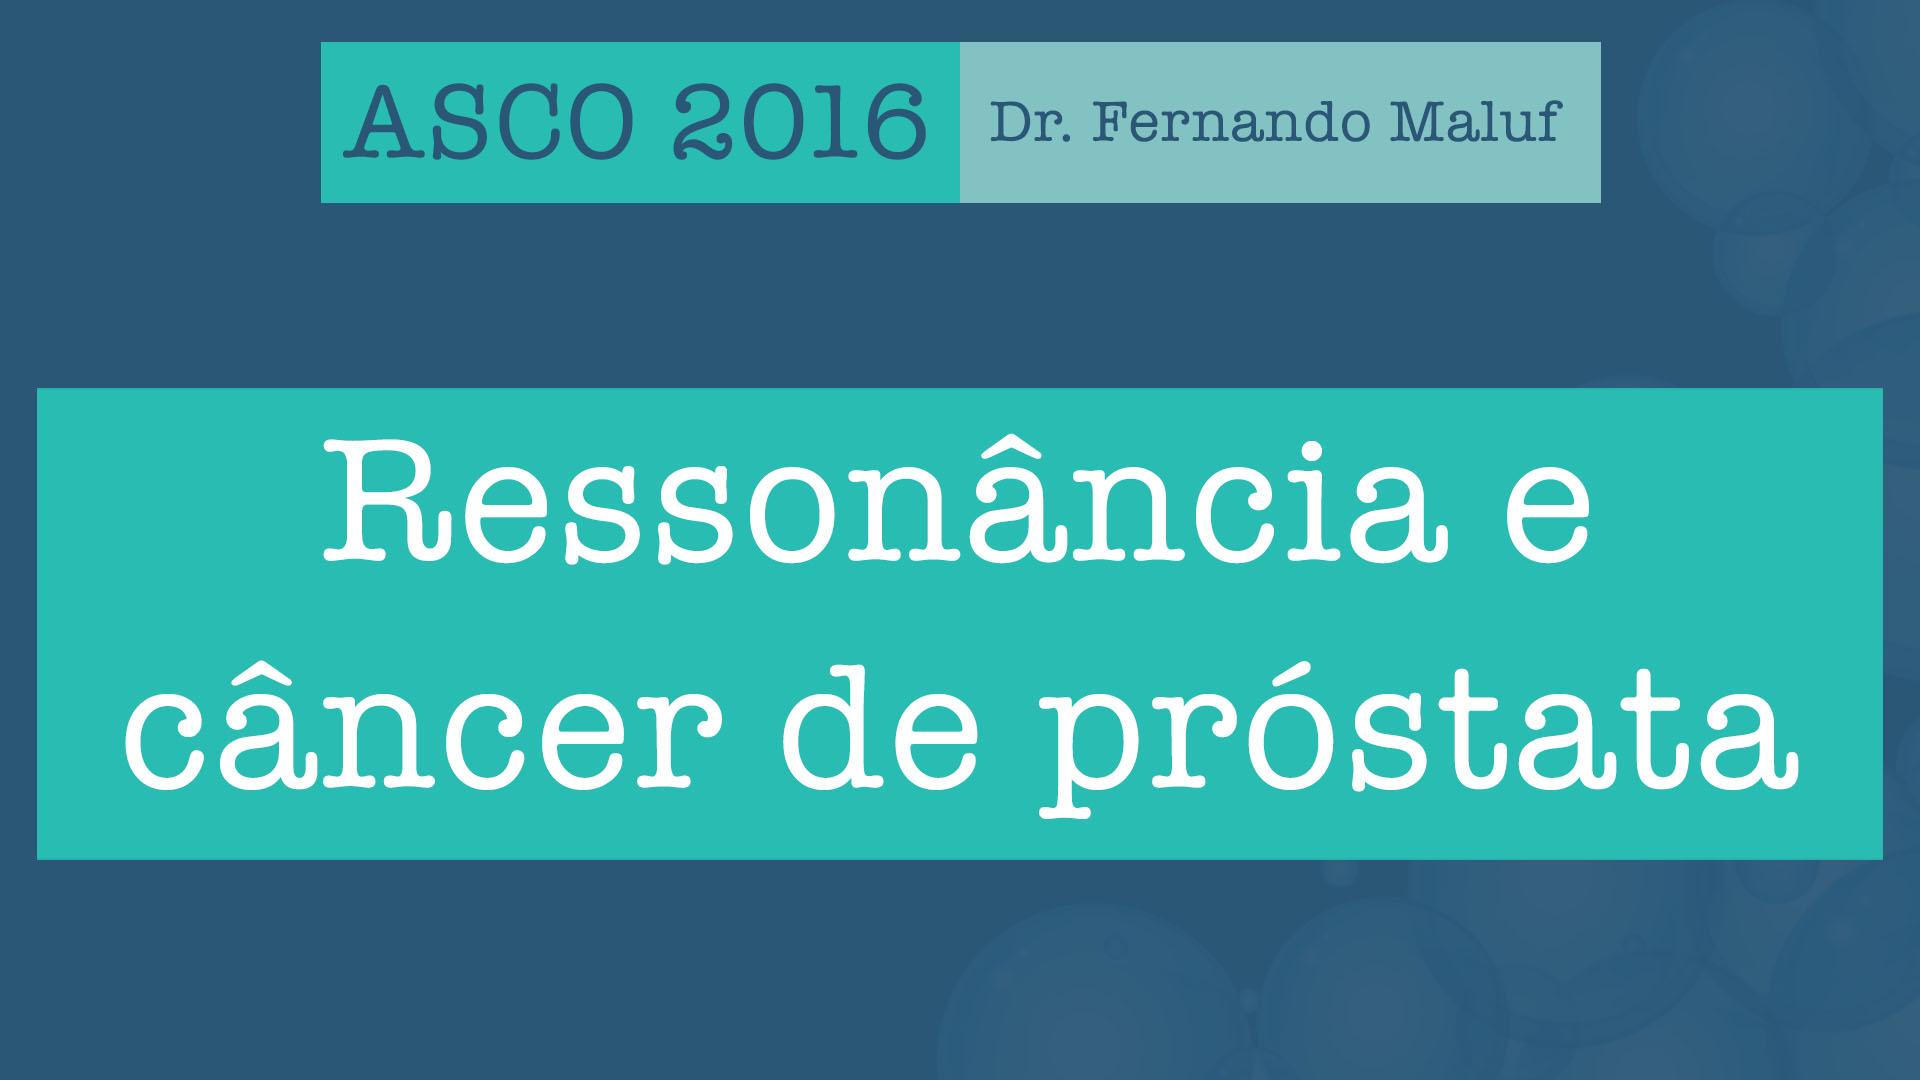 asco 2016 ressonância próstata